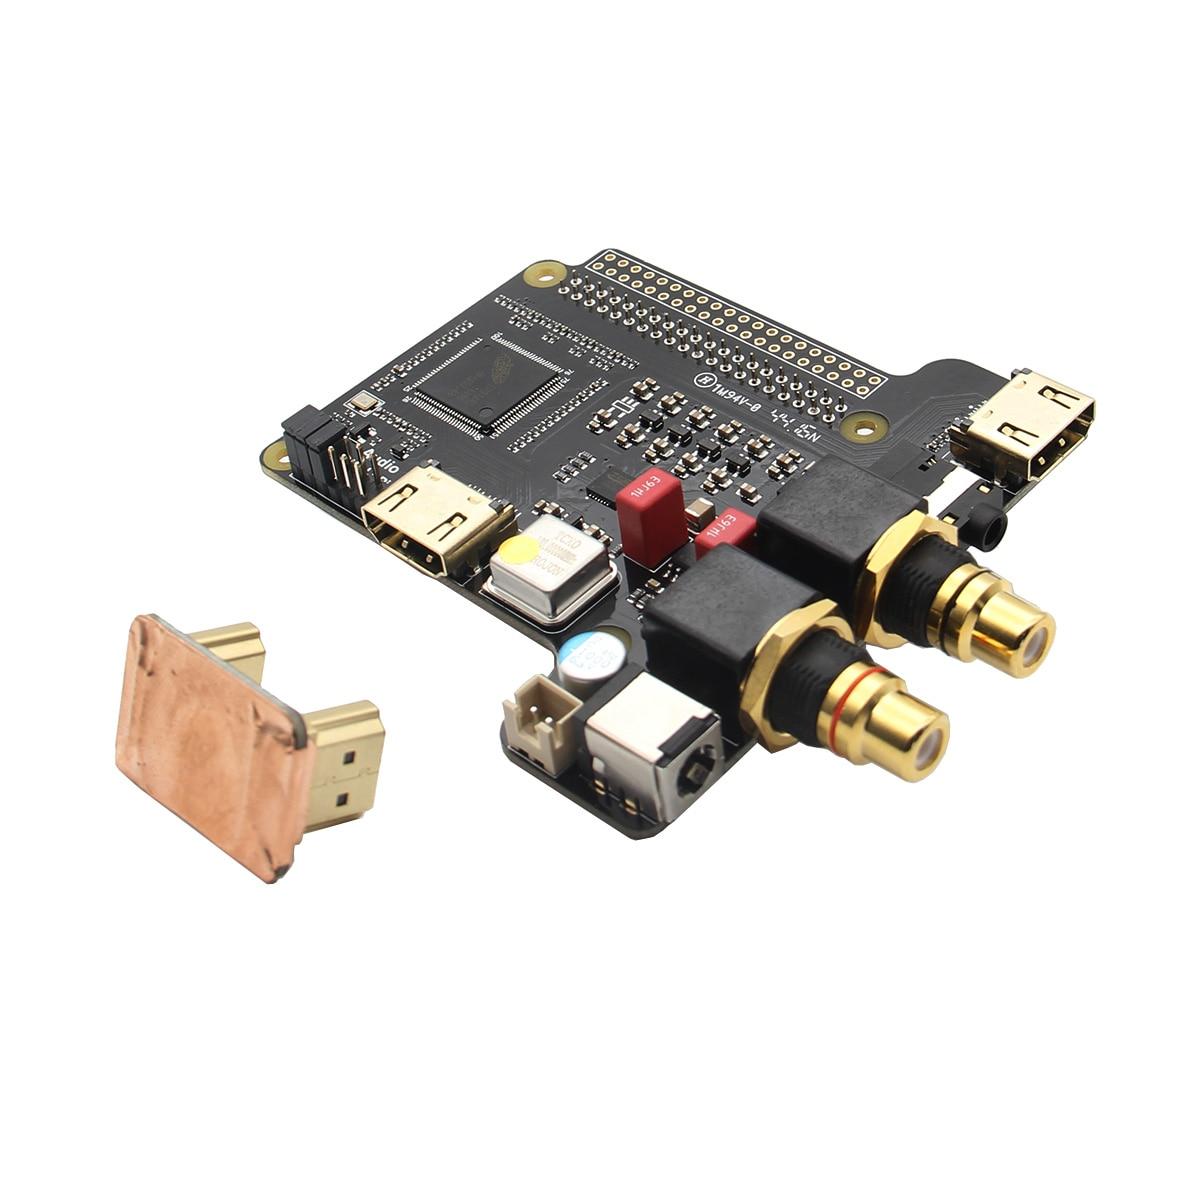 X4000 Expansion Board HIFI Audio Mini PC For Raspberry Pi 3 Model B / 2B / B+